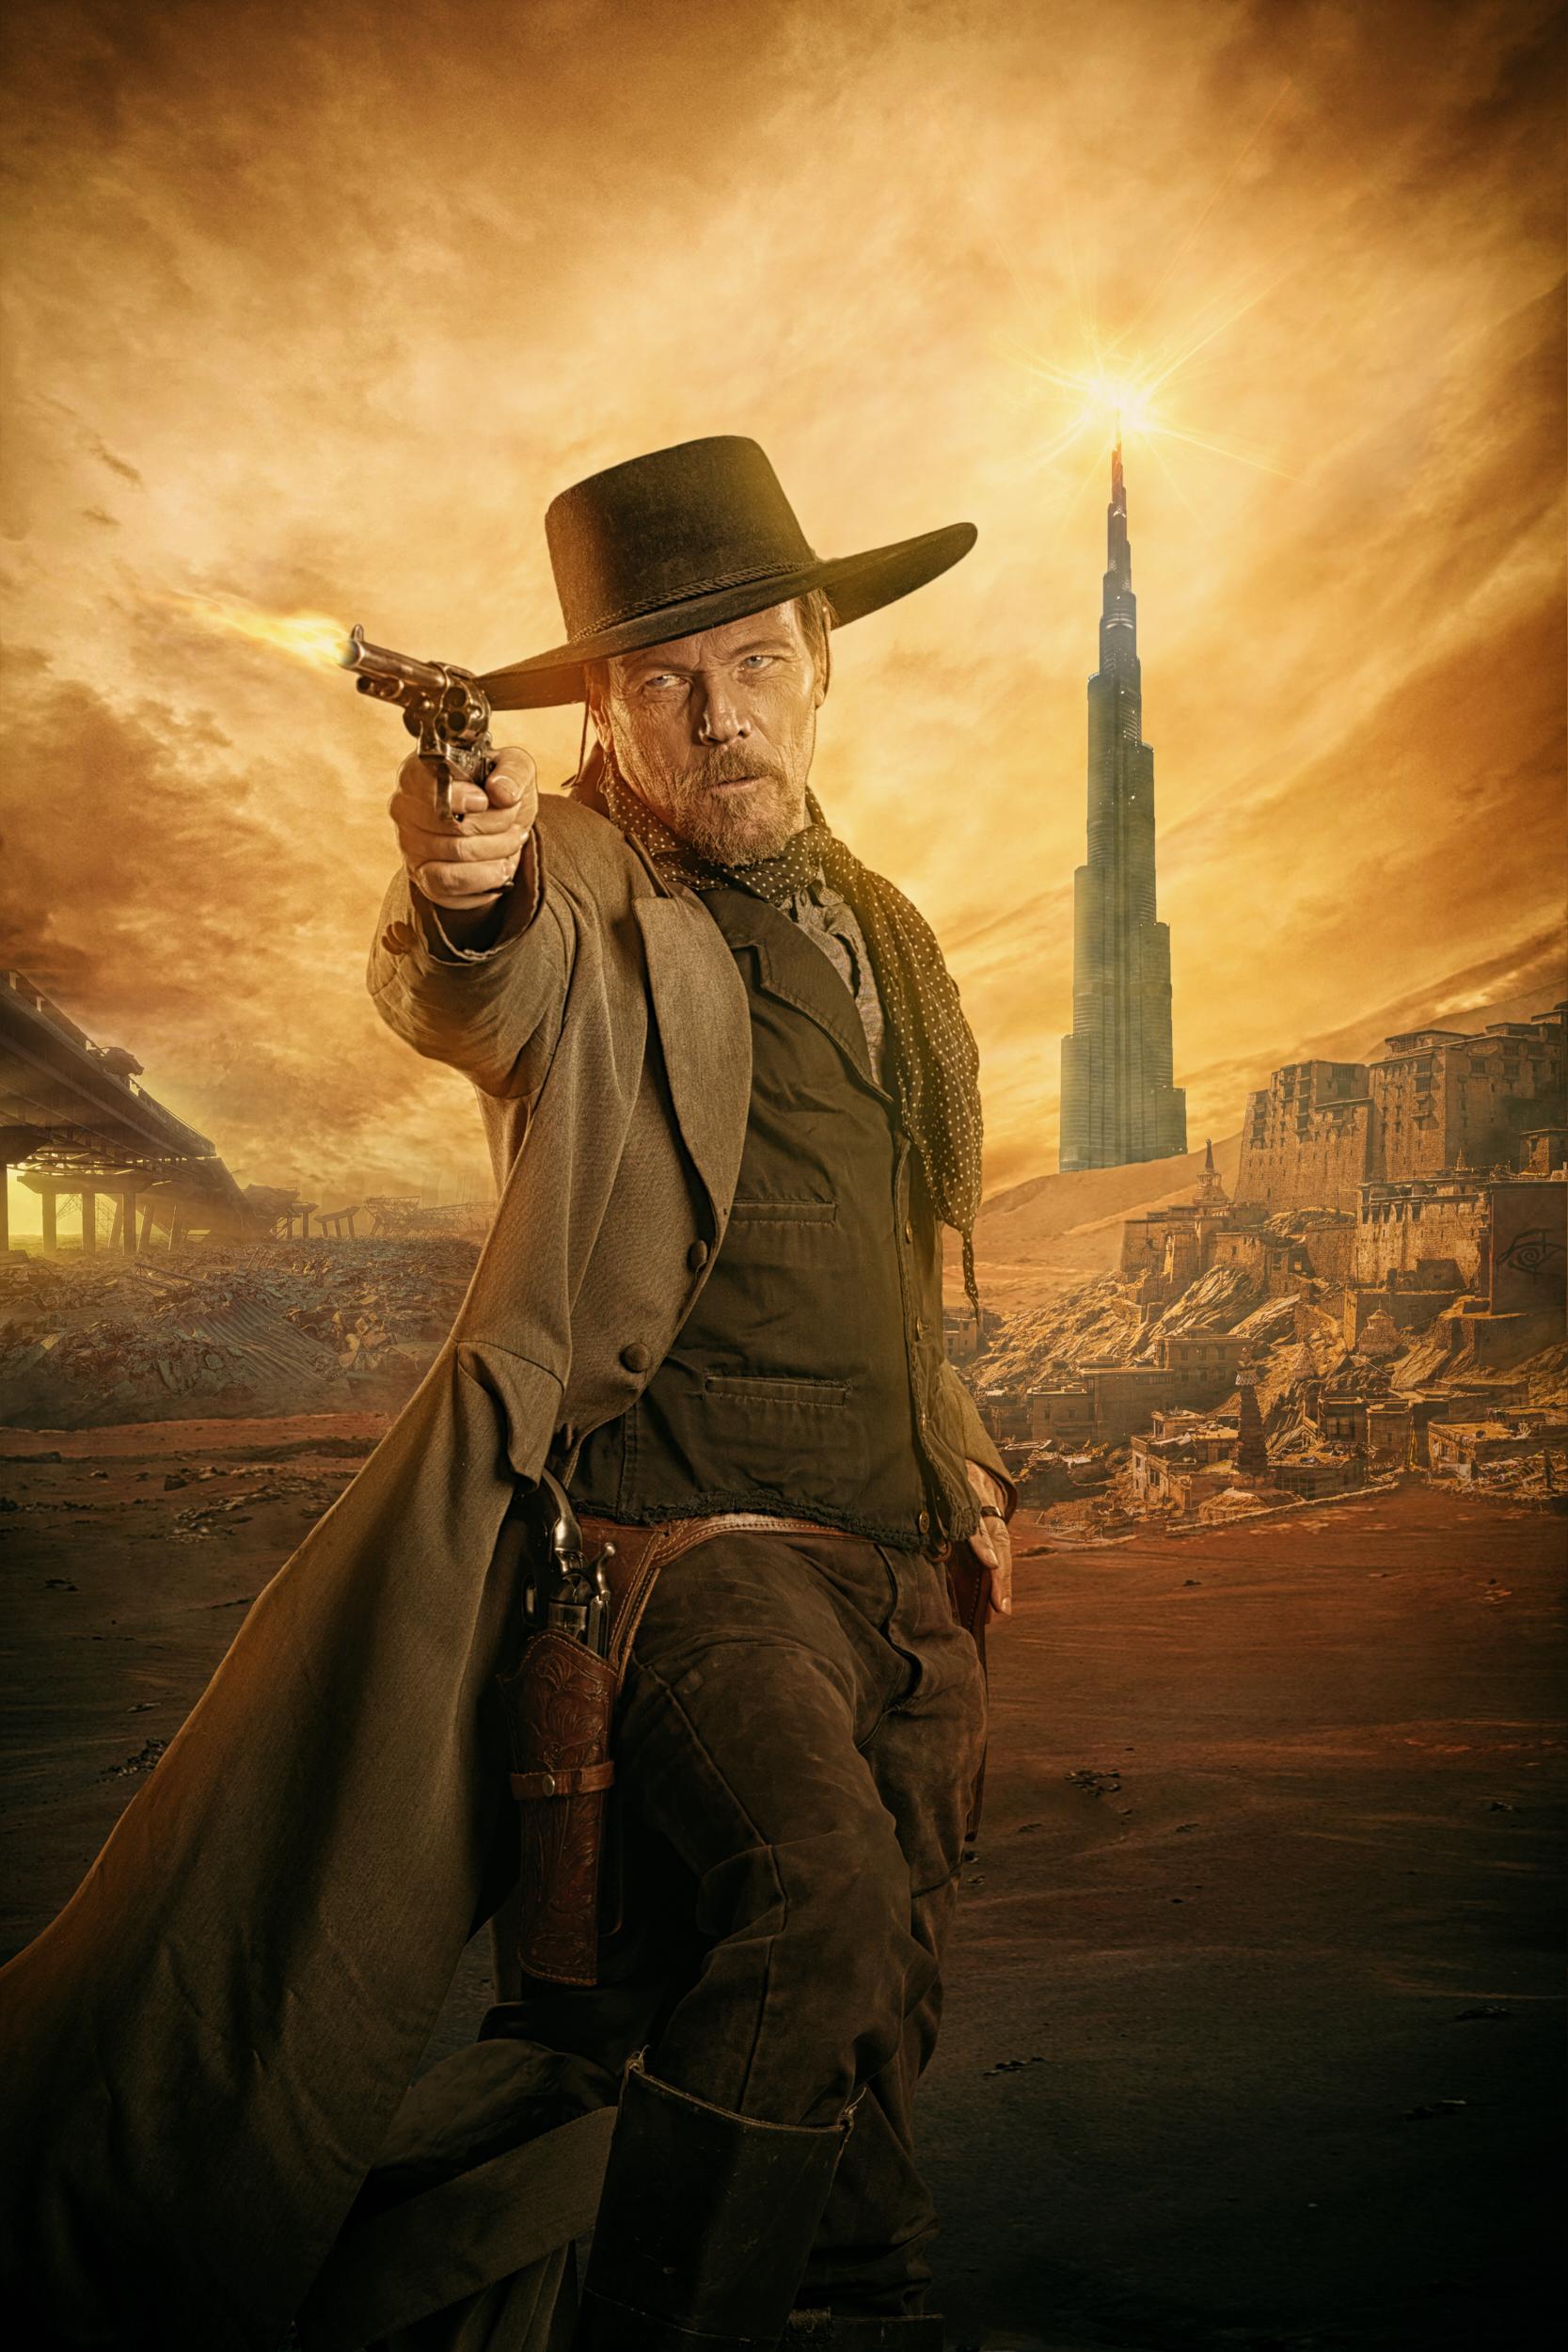 Roland Deschain, Gunslinger from Stephen King's Dark Tower story photographed by Paul Davis Photography, Tucson, Arizona.